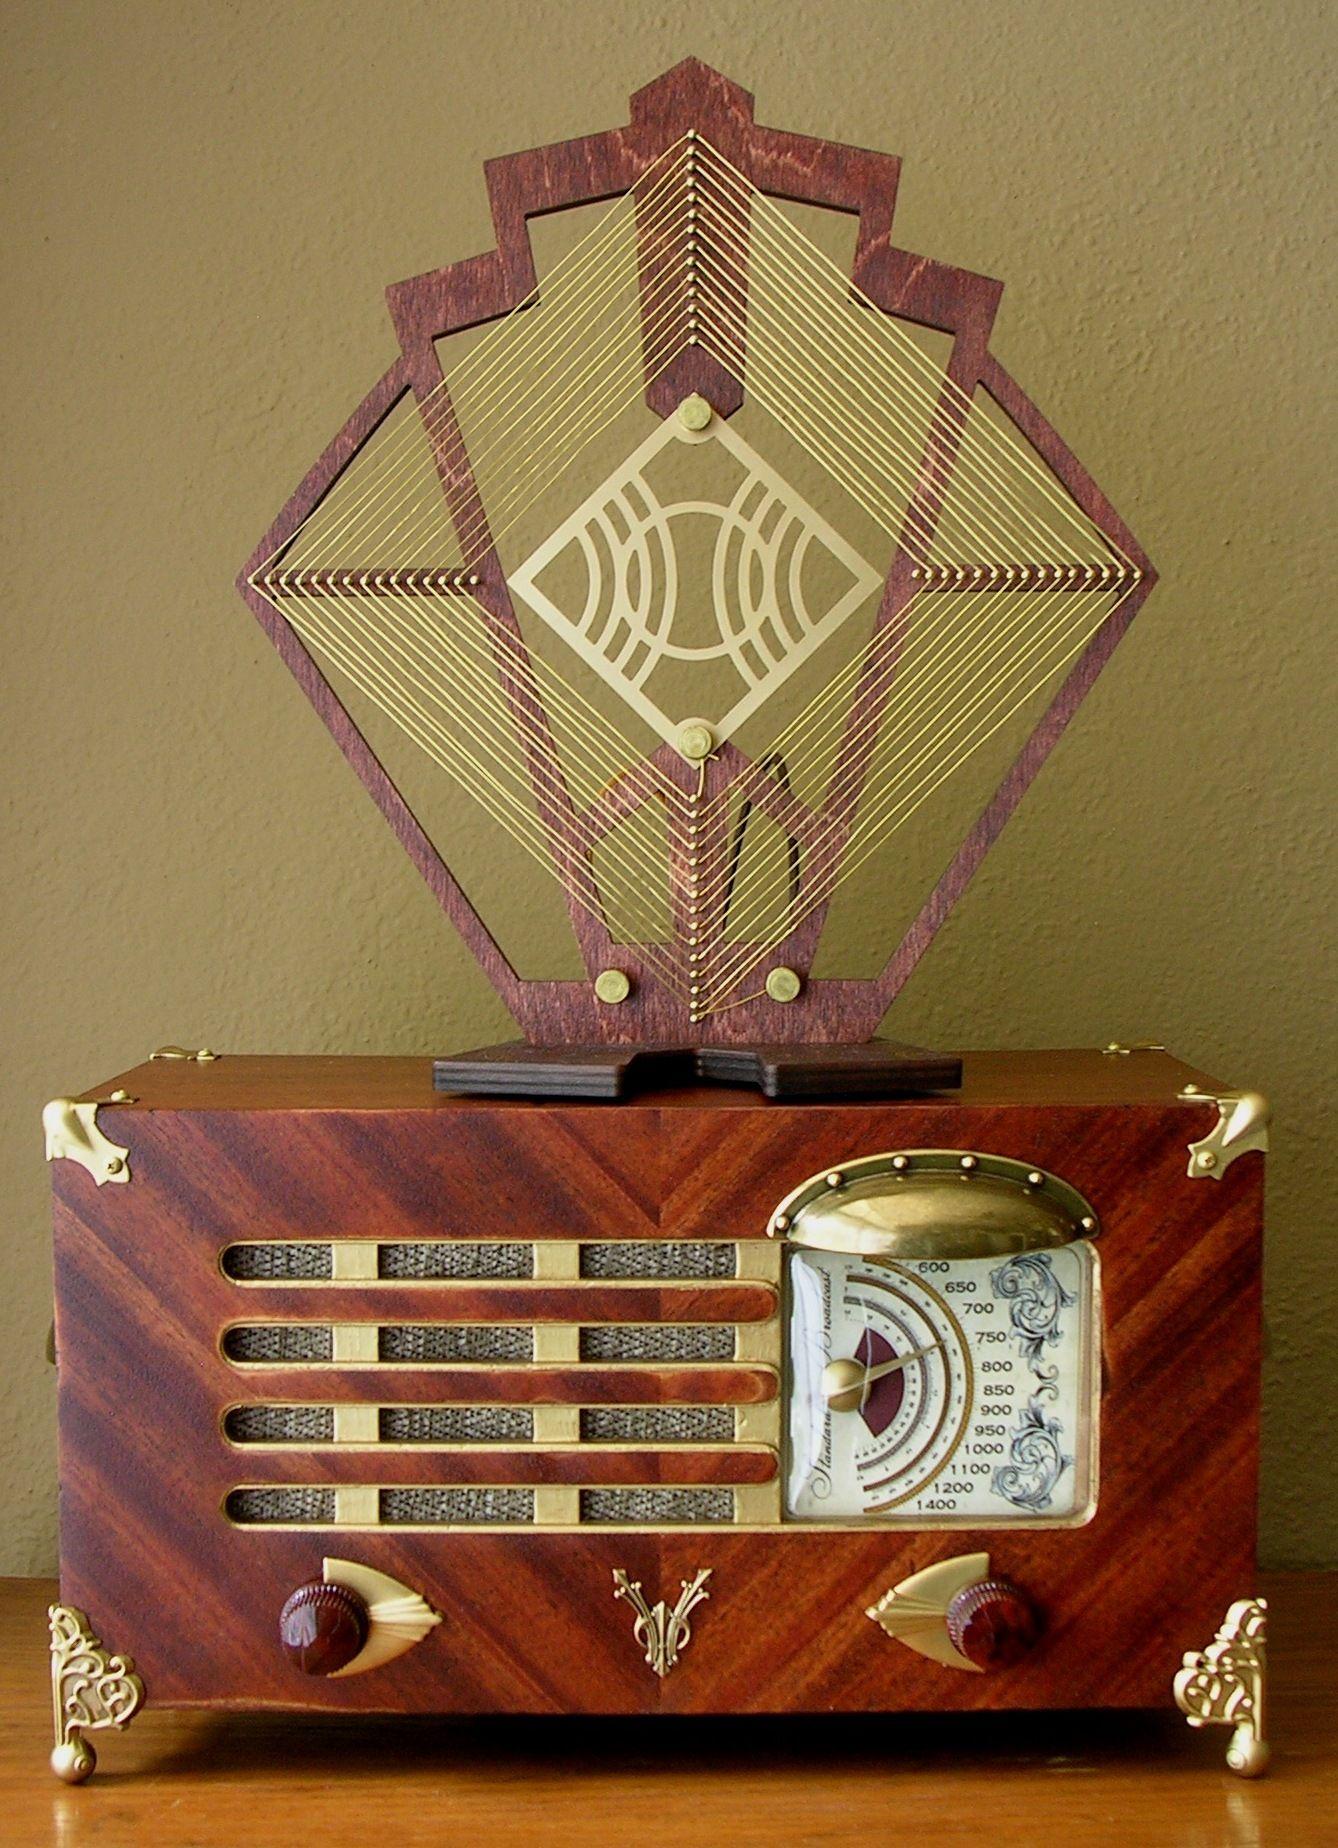 1948 Philco 48 214 2 Jules Vern AM Radio